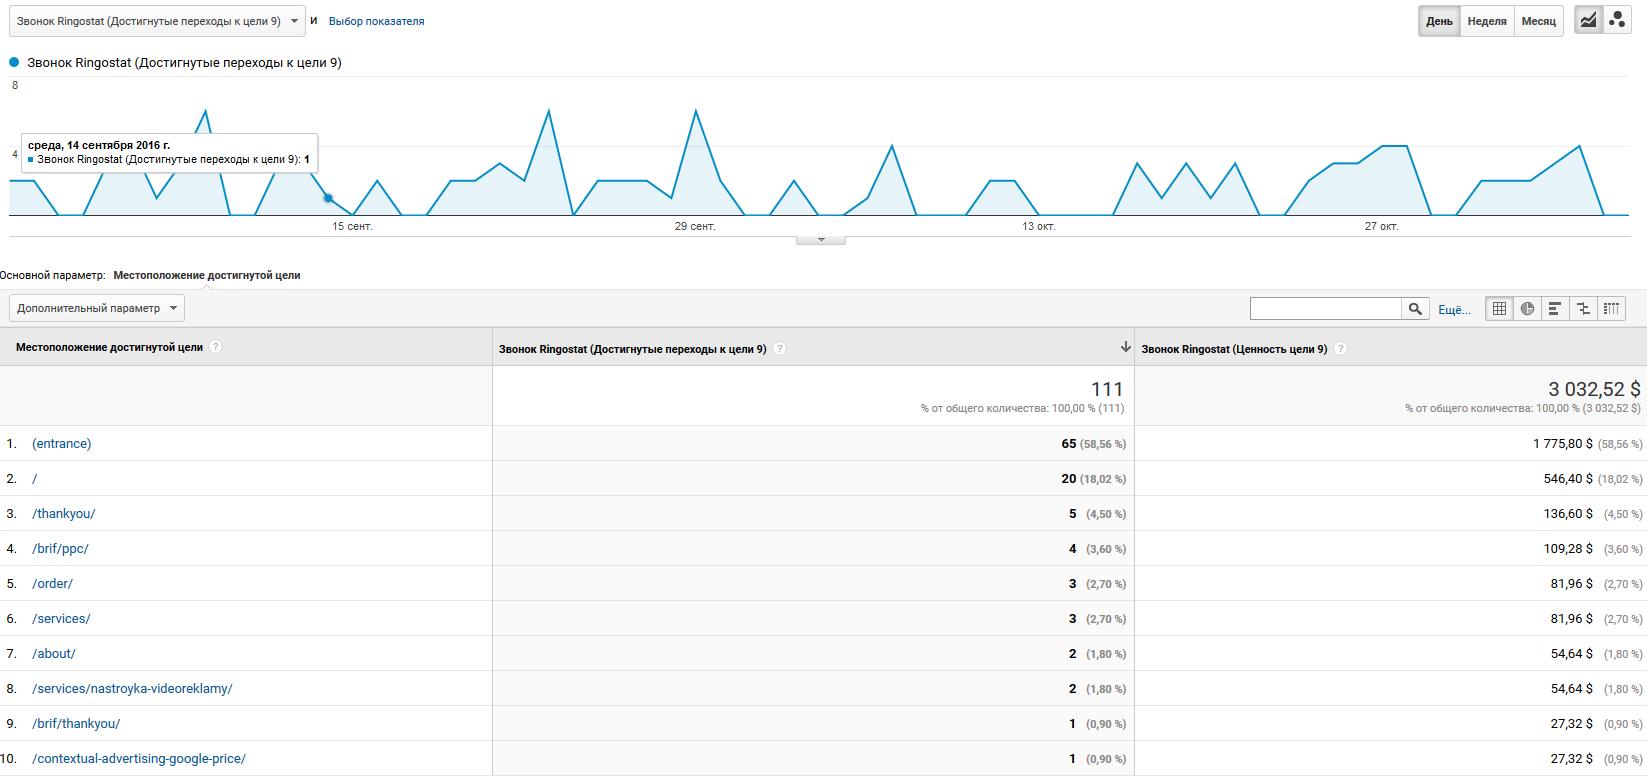 url целей в отчёте по конверсиям в Google Analytics